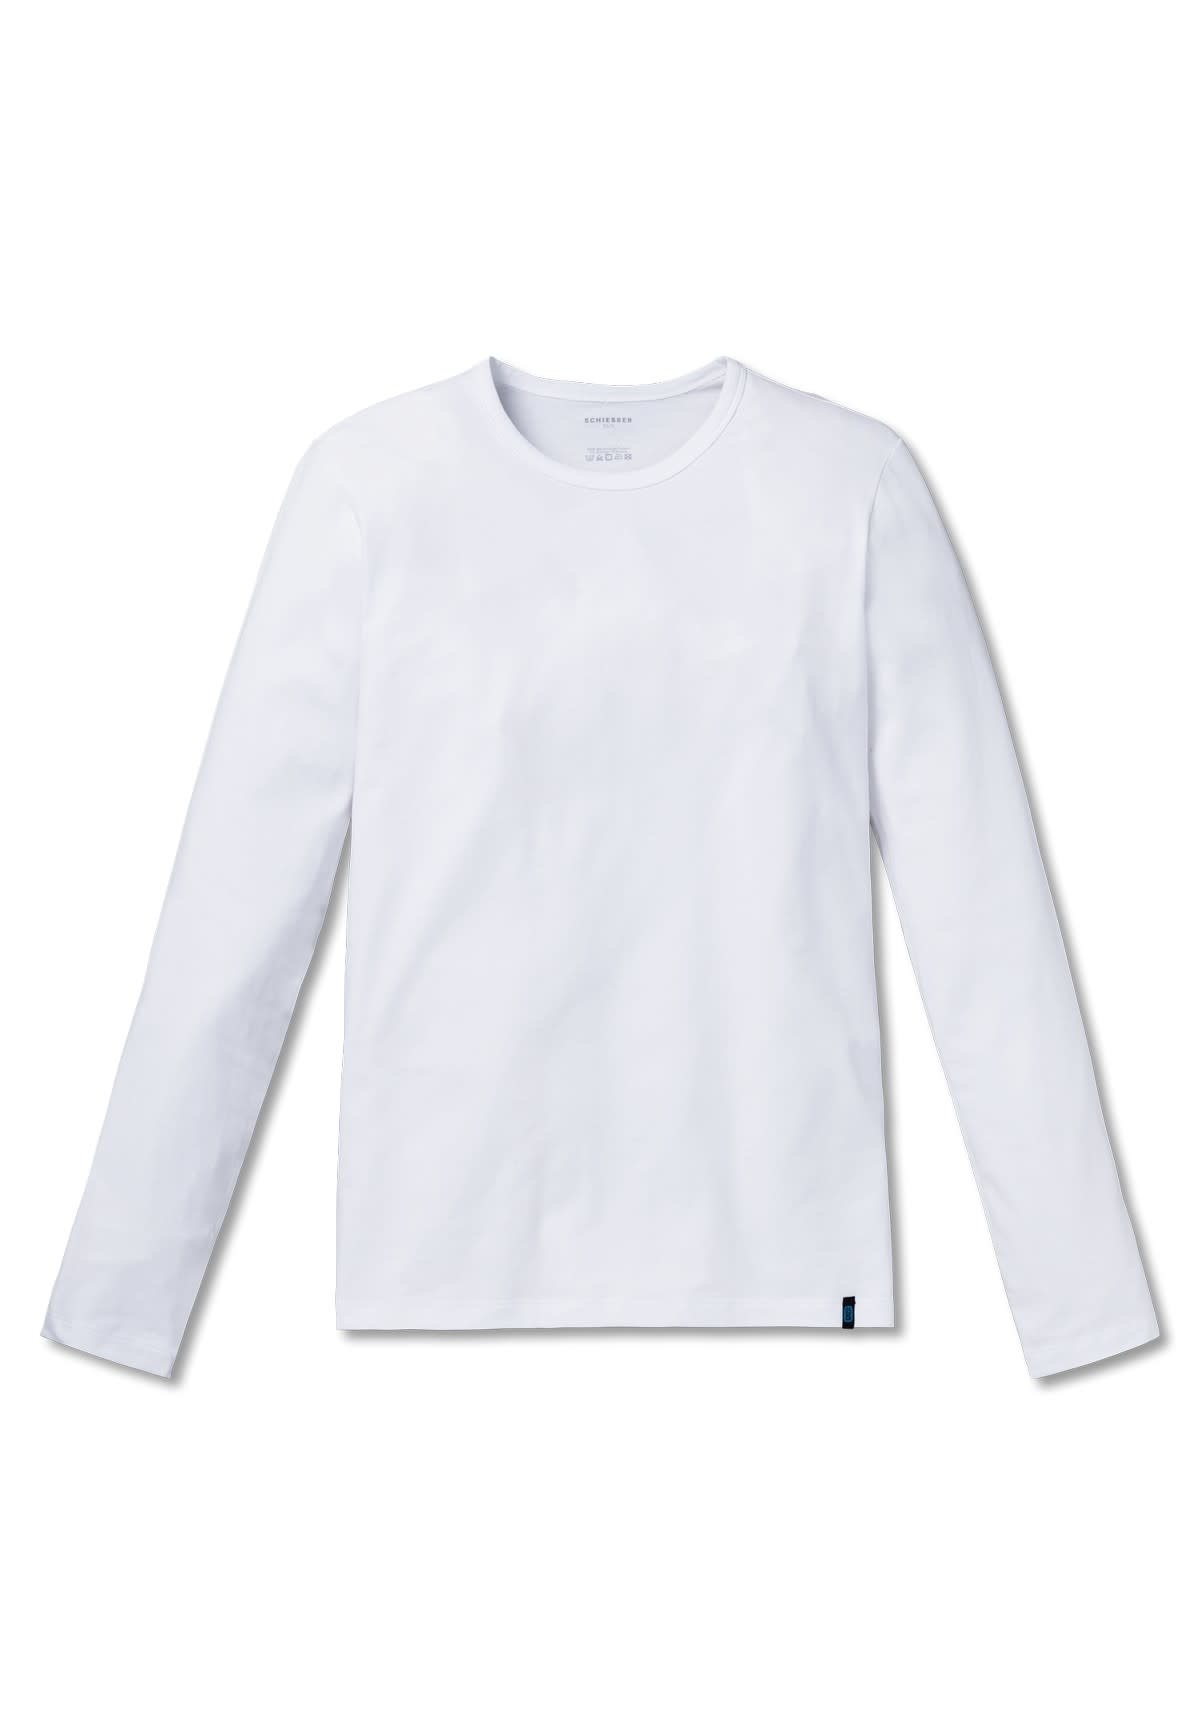 T-shirt lange mouw 95/5 205419 - wit-3